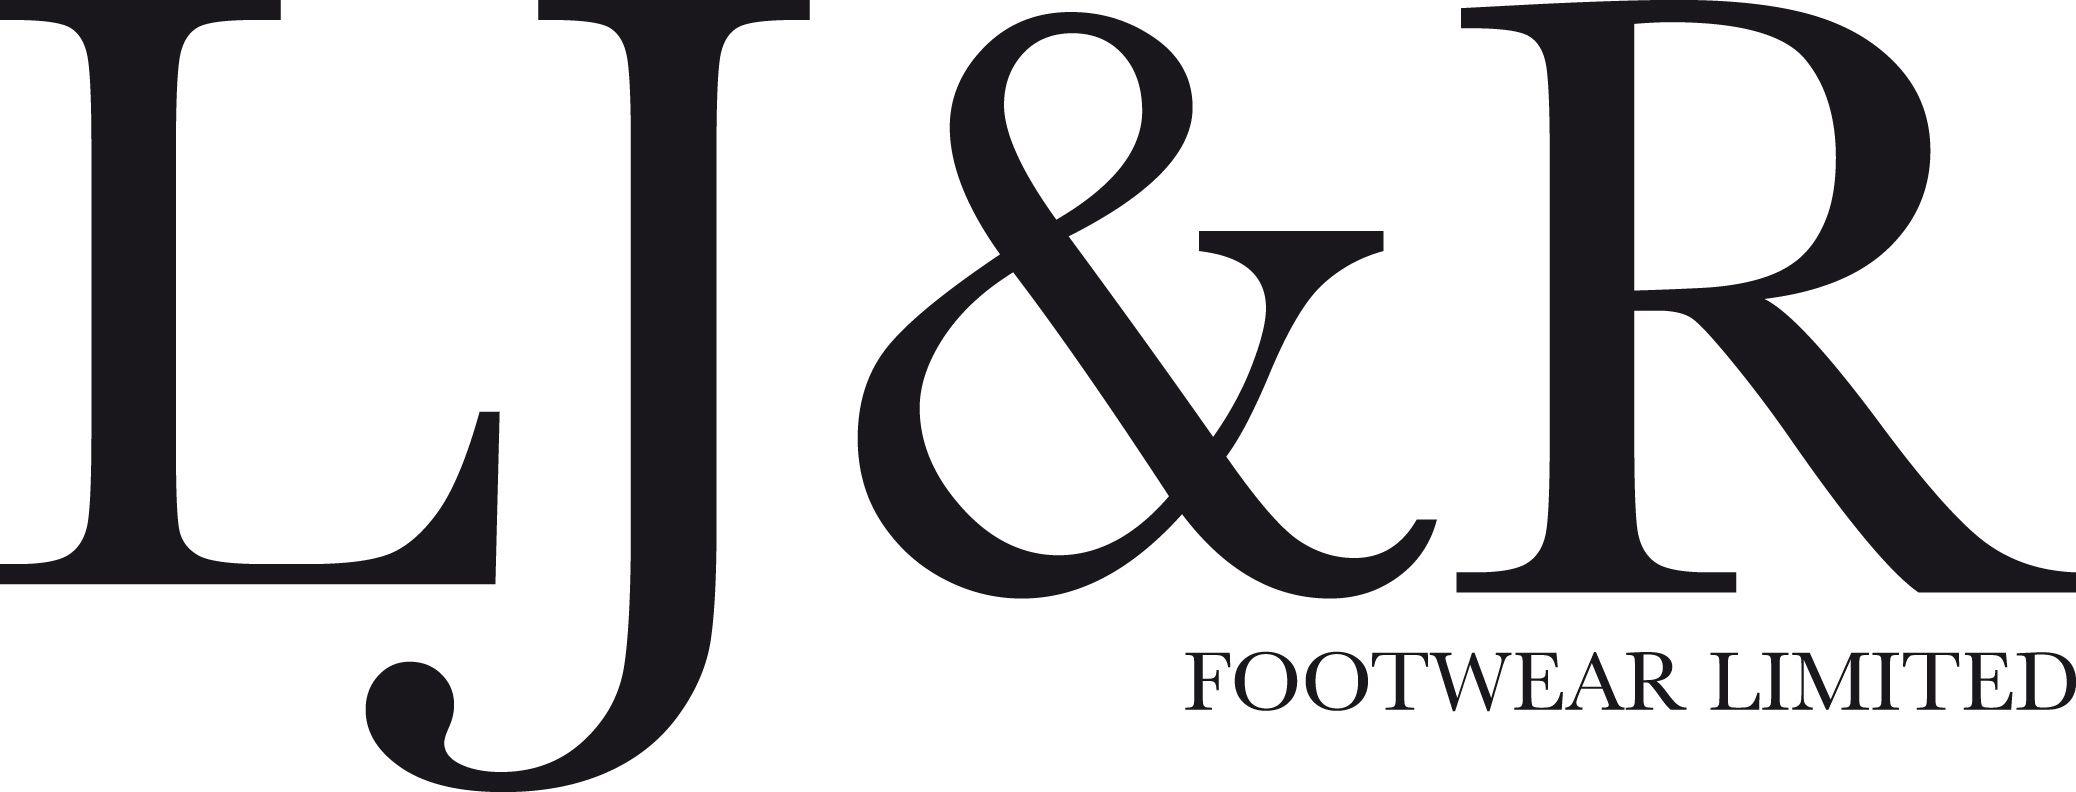 LJ&R Footwear Ltd